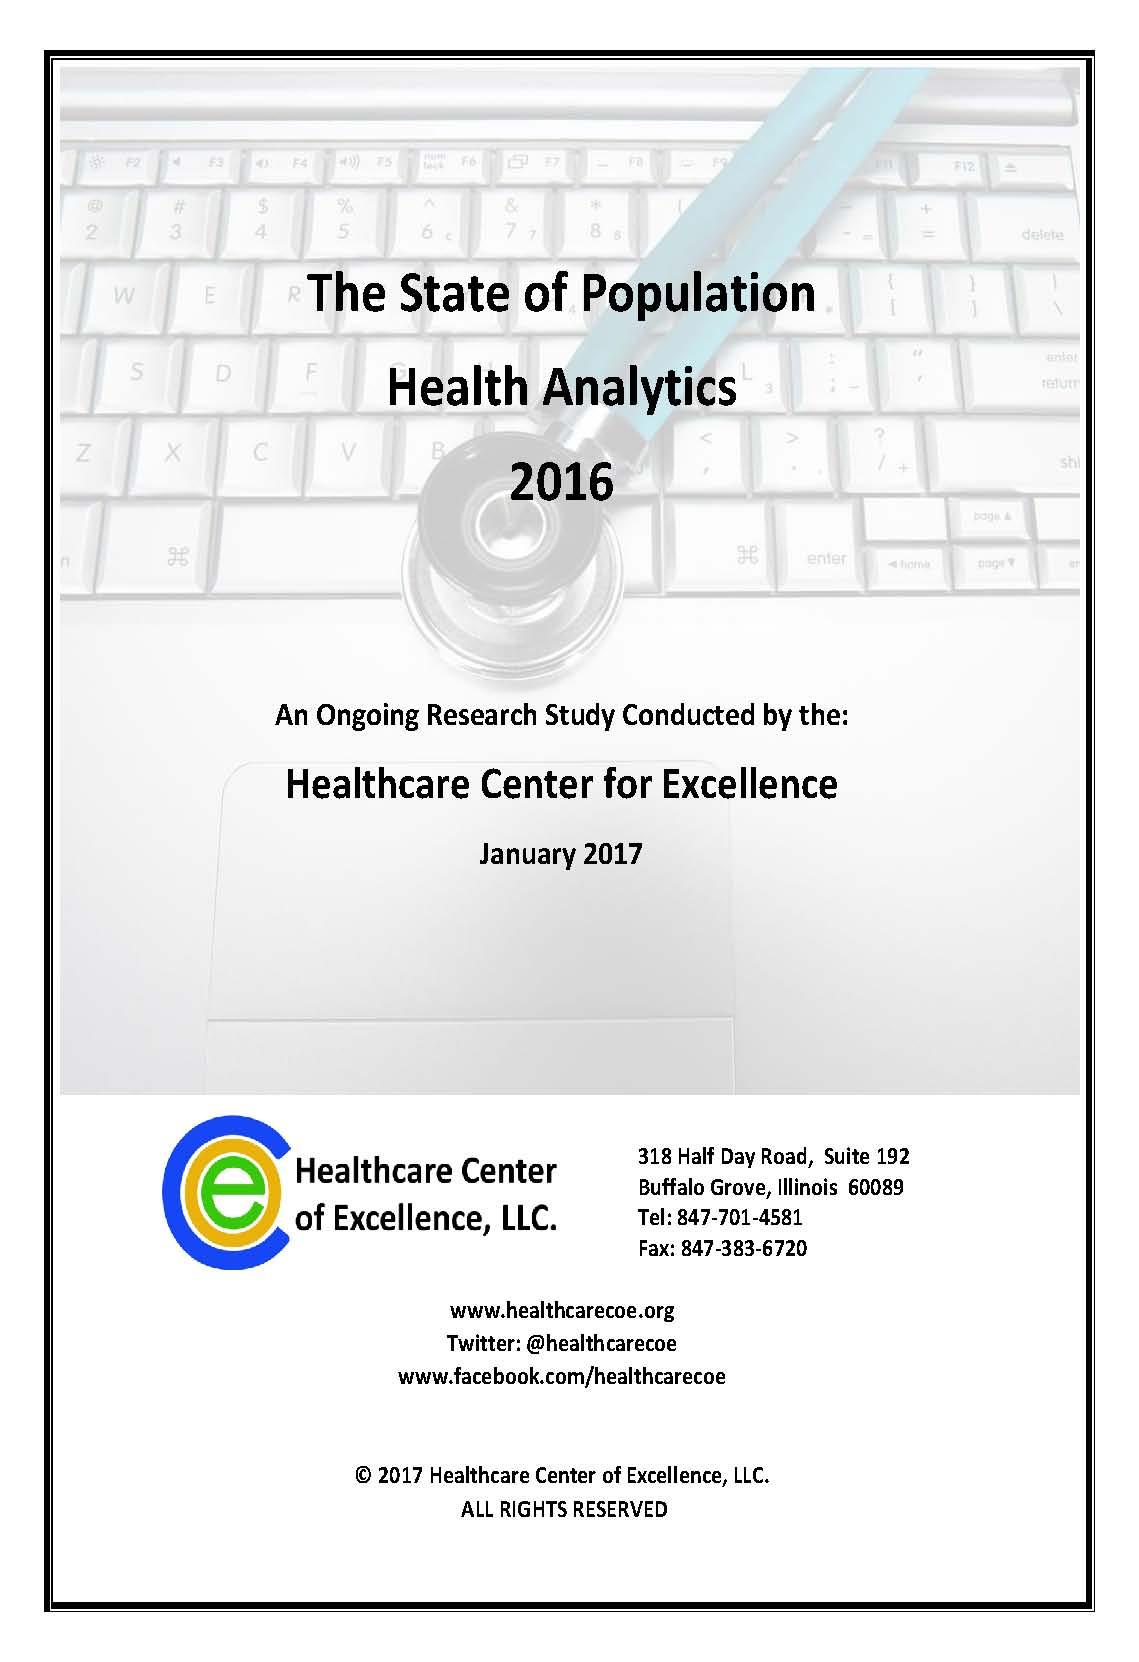 State of Population Health Analytics